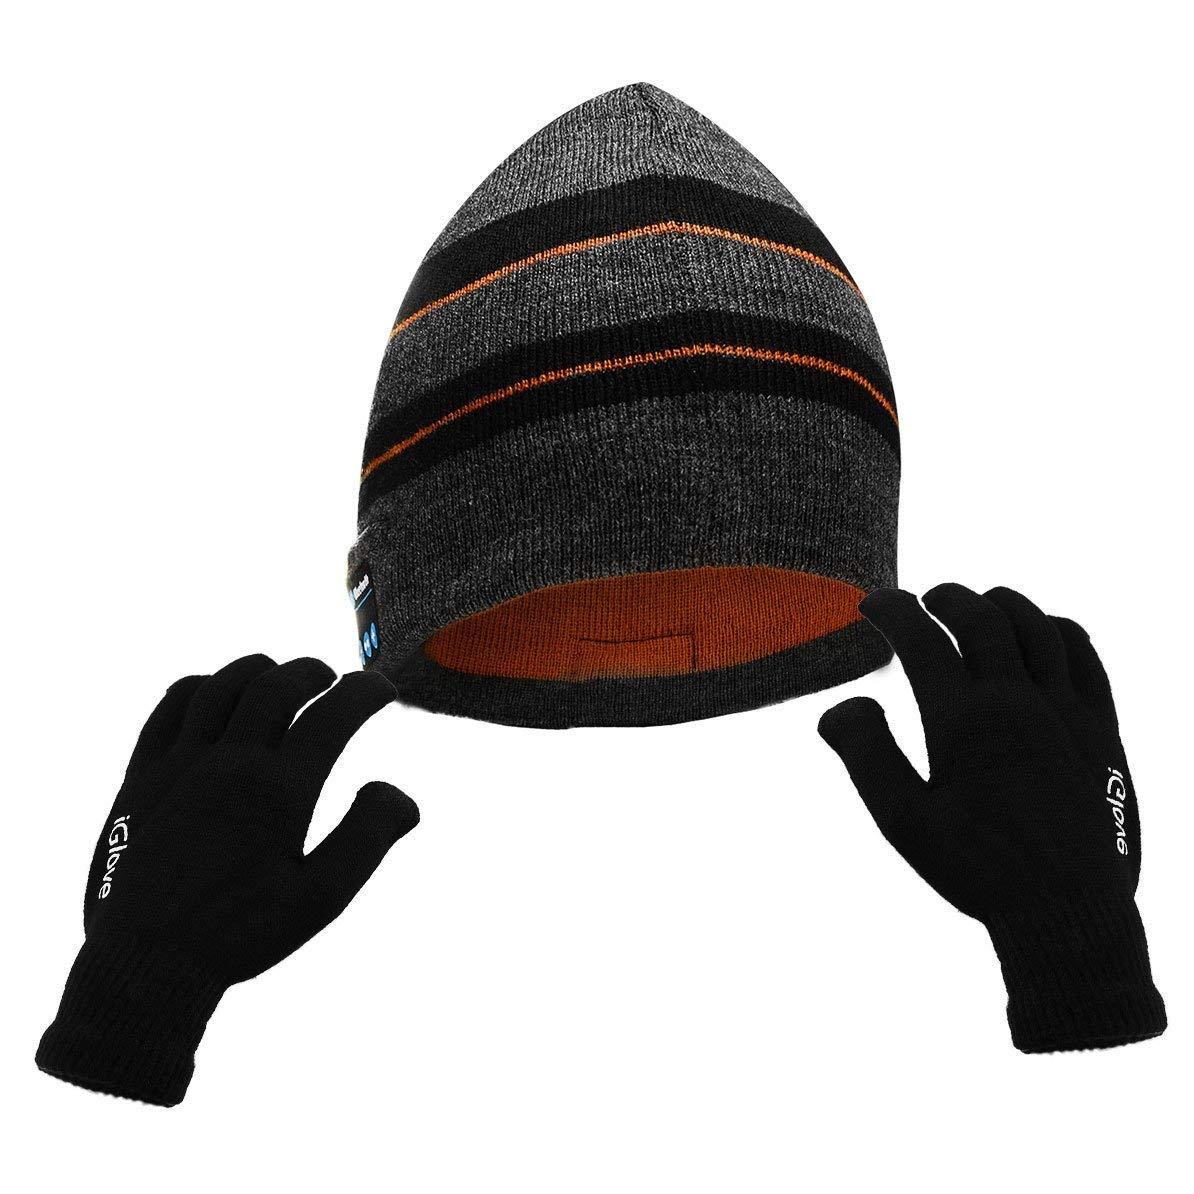 Allnice Musical Wireless Smart Beanie Hat Bluetooth Hat with Eloves for Men, Women